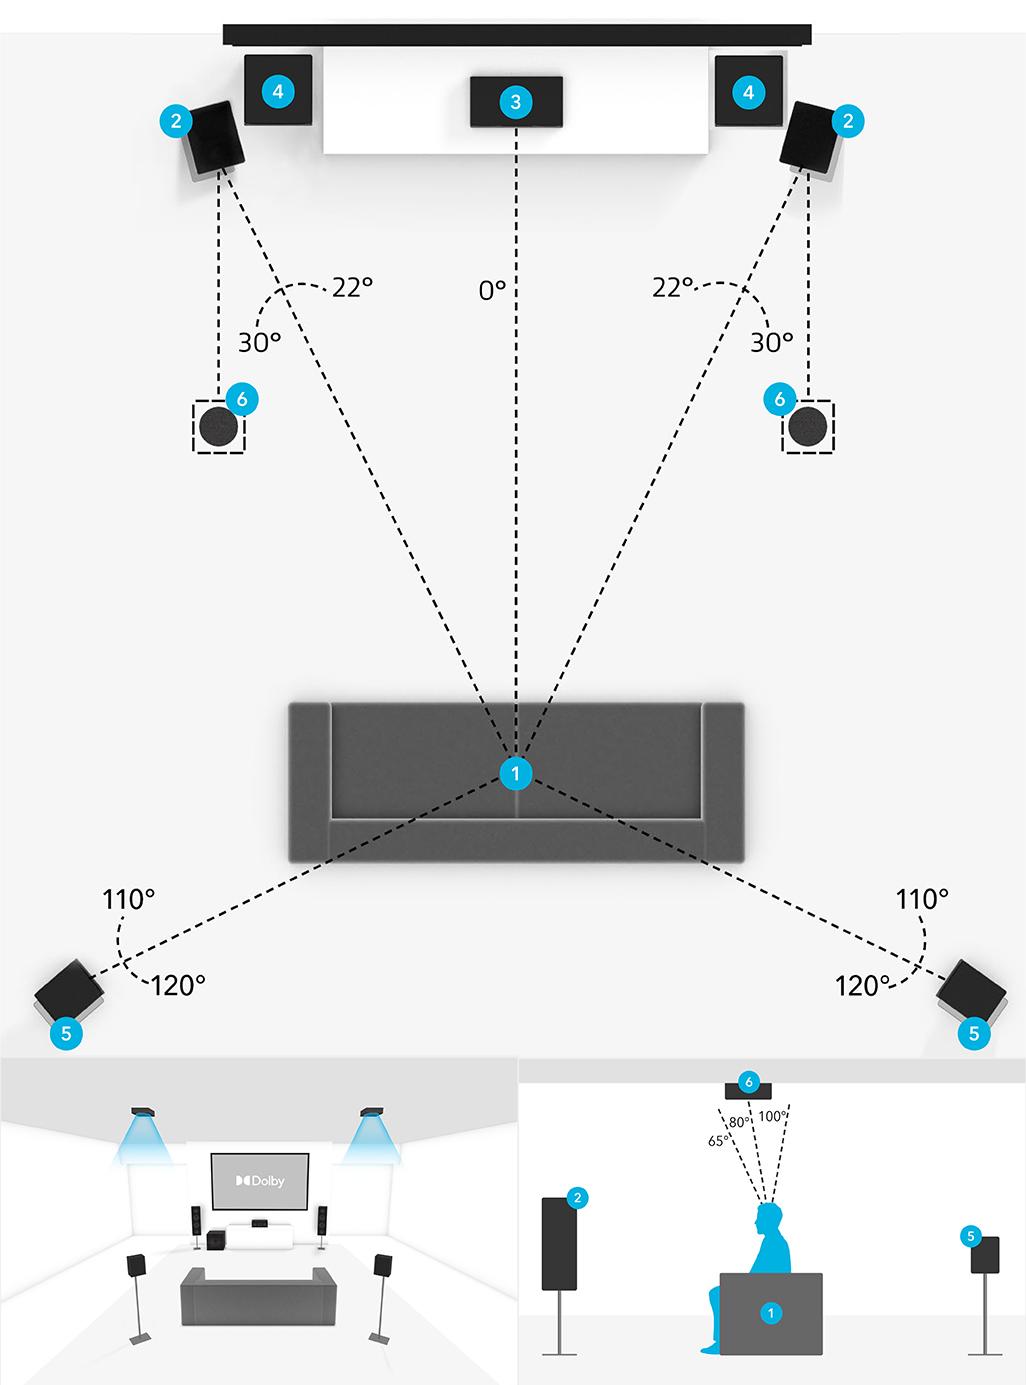 5.2.2 Speaker Placement